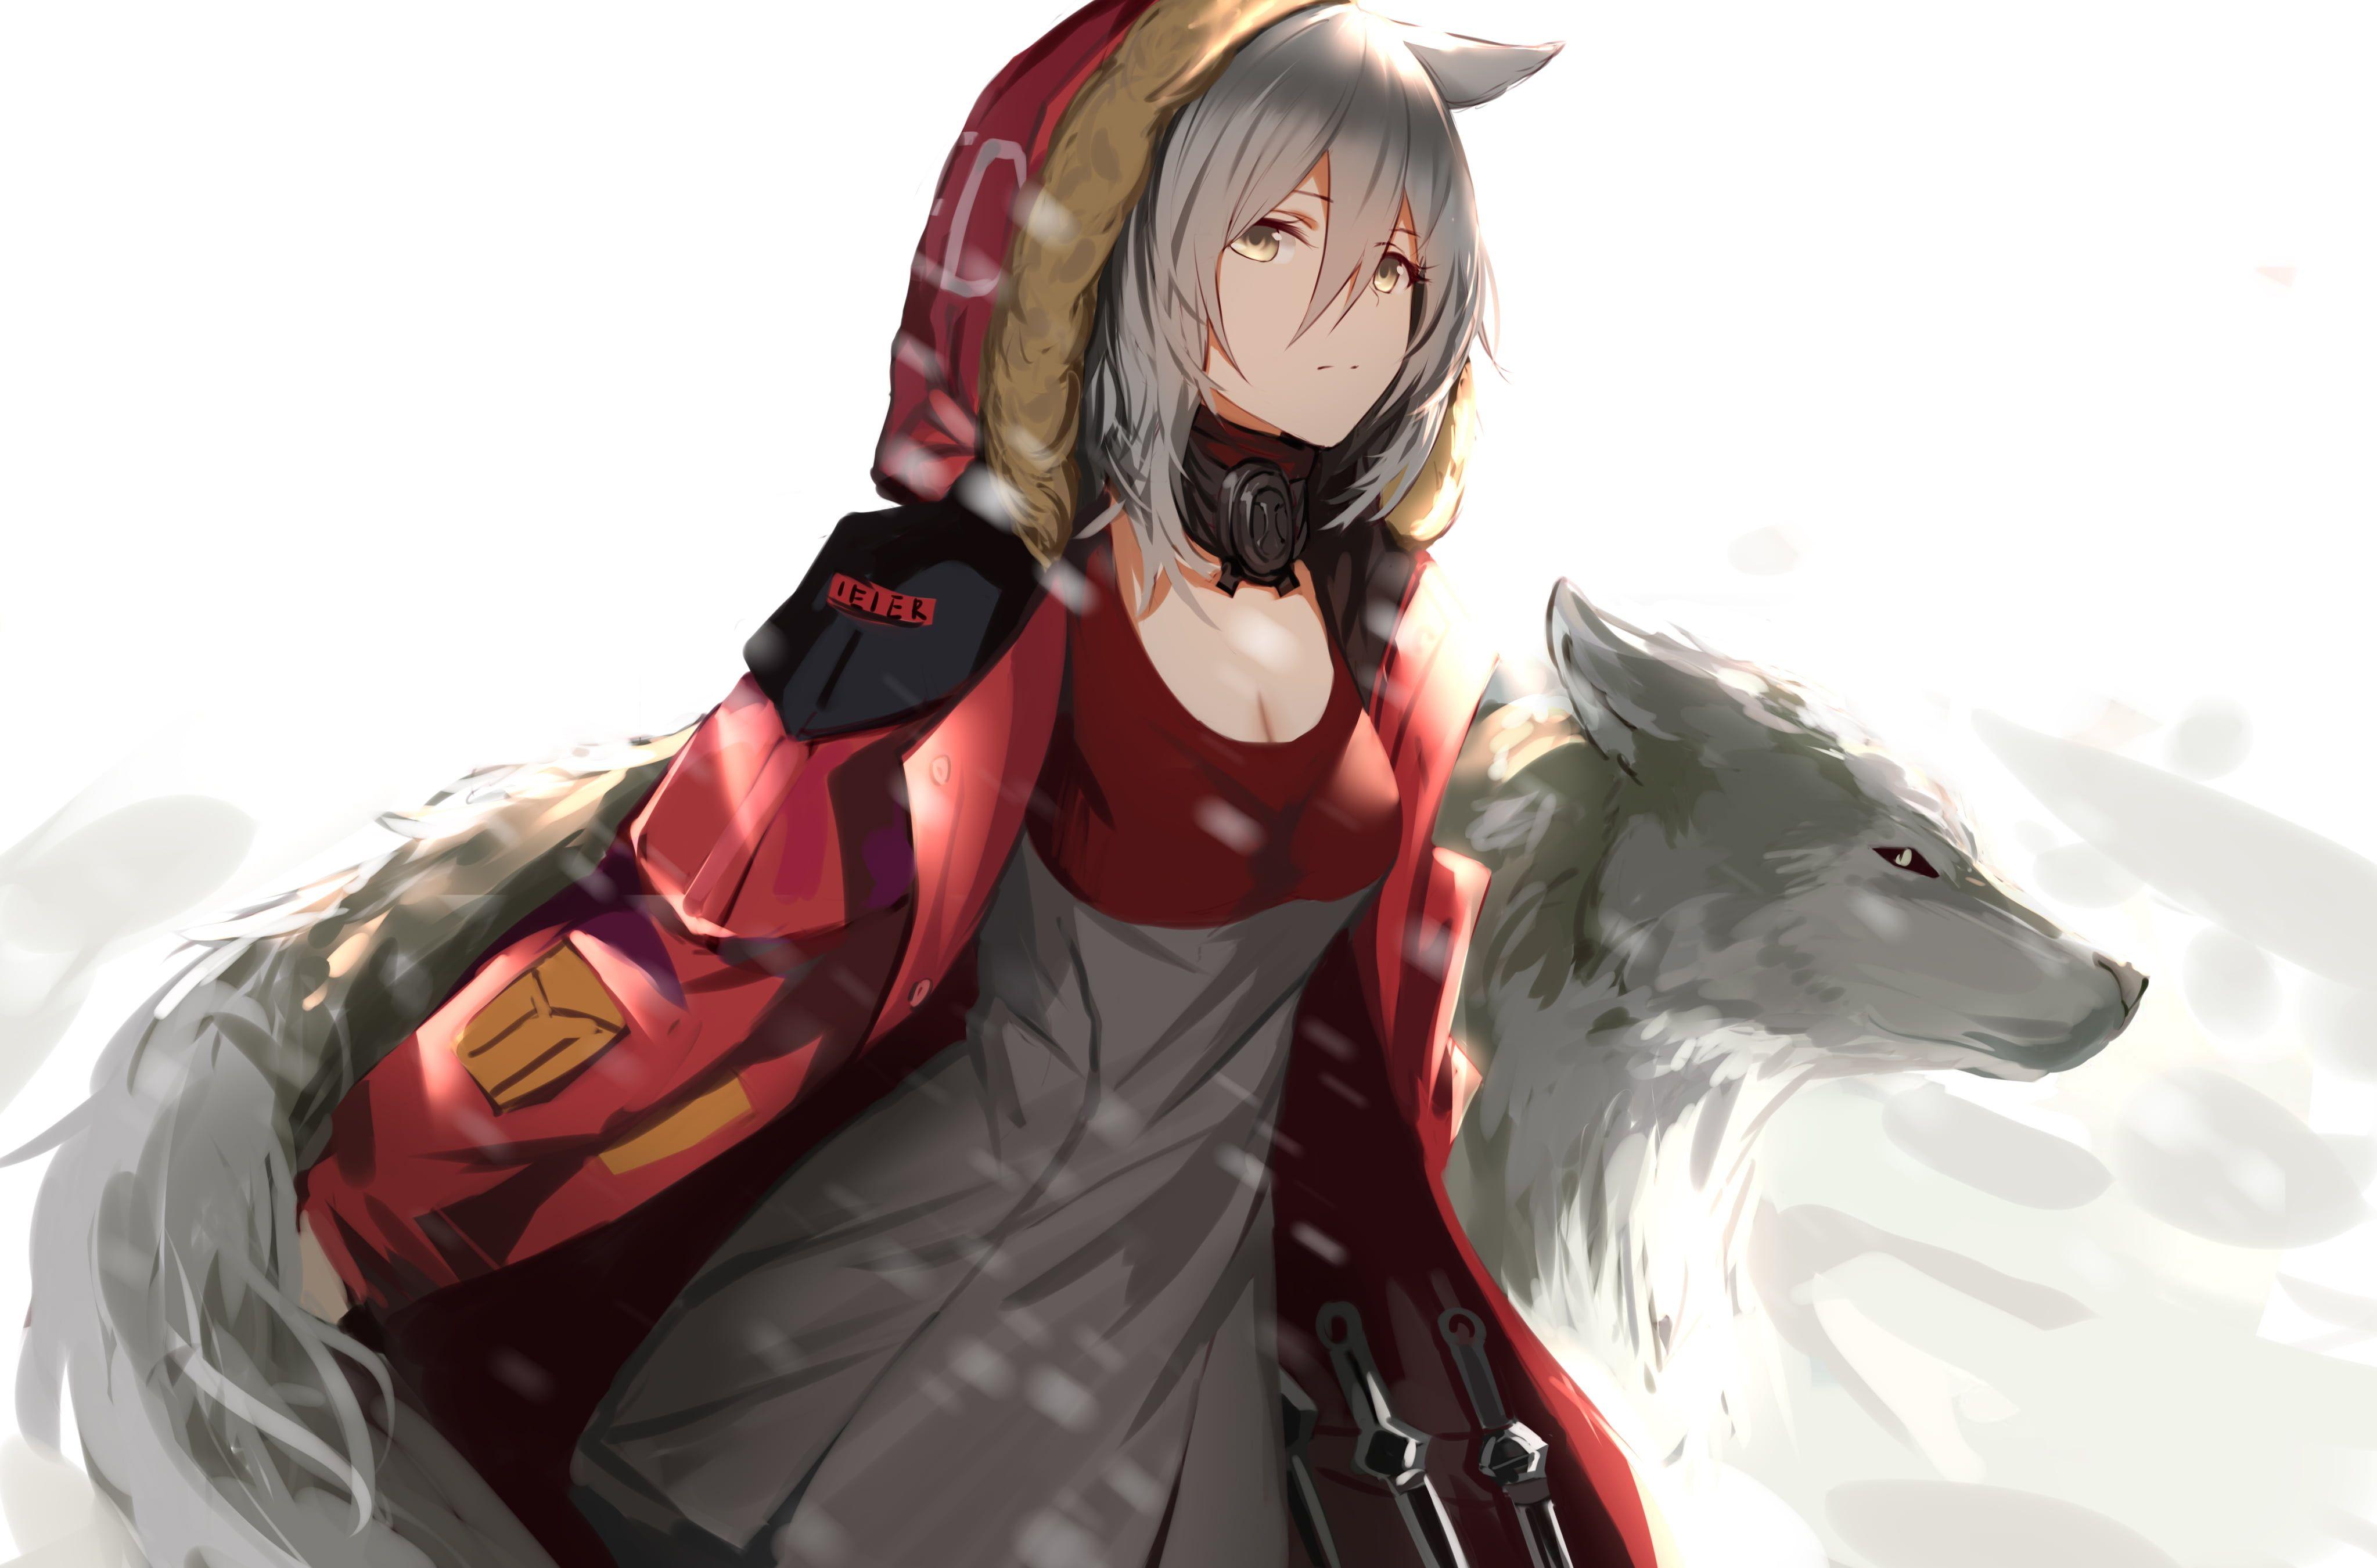 Anime Girls Wolf Digital Art Yasuri Anime Artwork Arknights 4k Wallpaper Hdwallpaper Desktop Anime Wolf Girl Anime Wolf Anime Art Girl